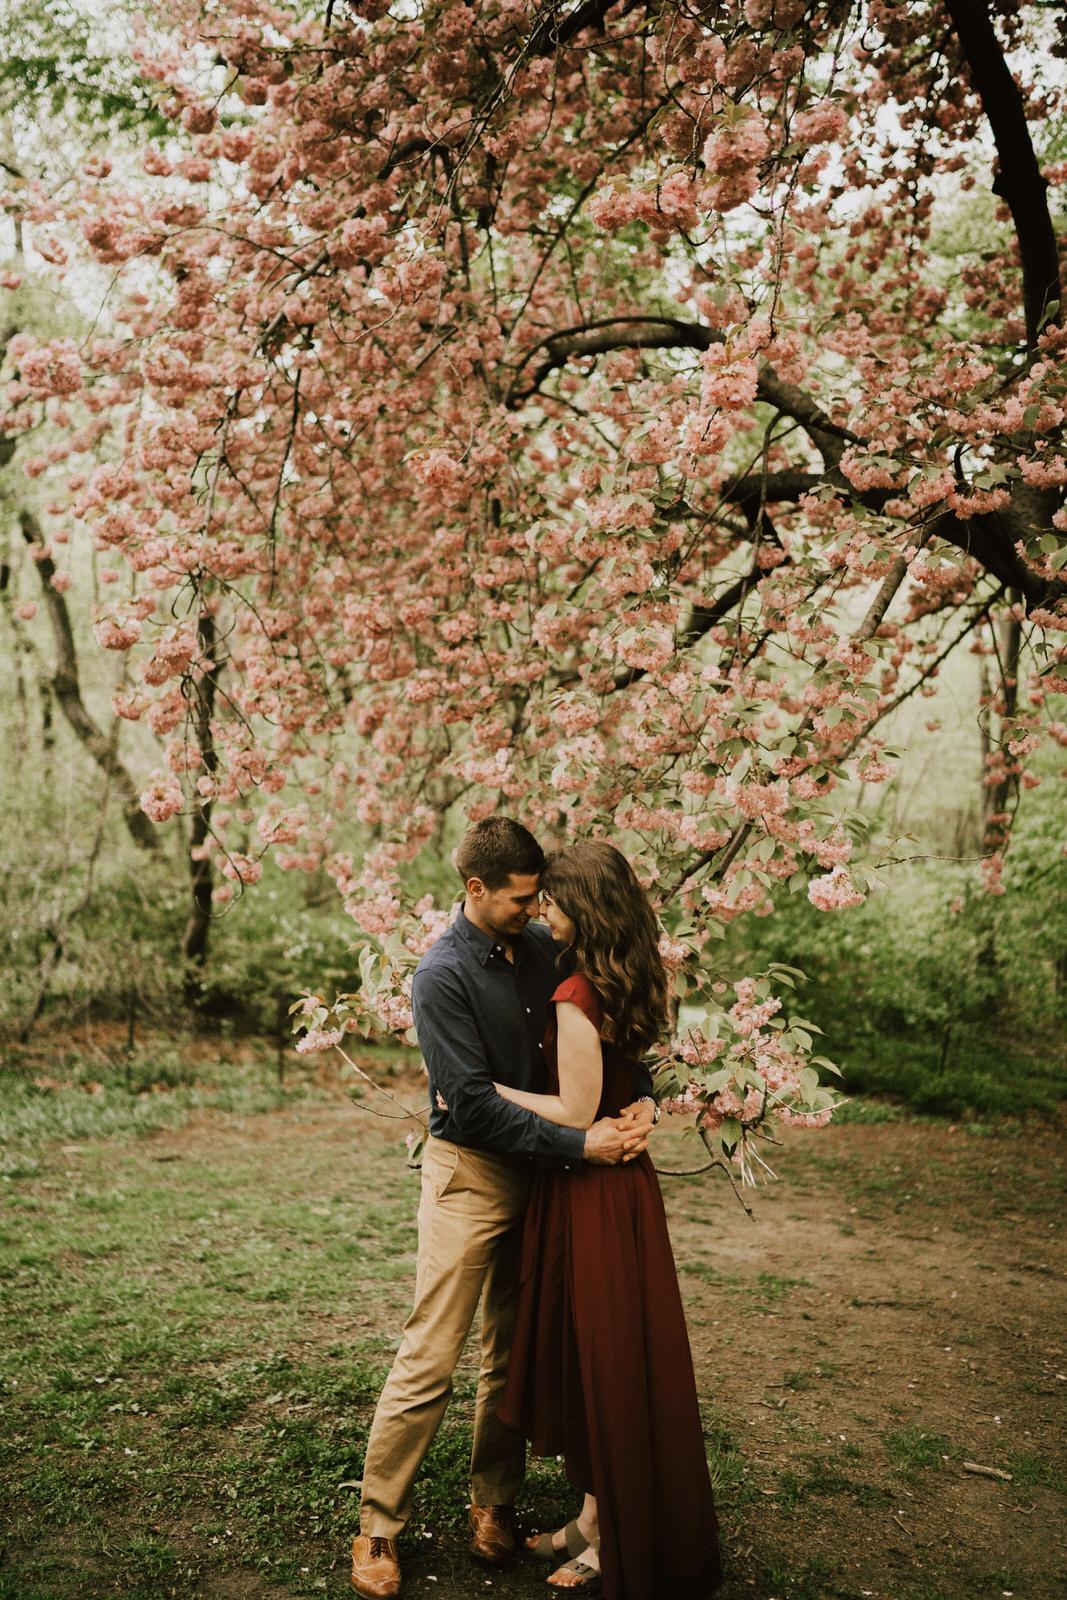 Central Park NYC Engagement Photos- Michelle Gonzalez Photography - Ashley and Joseph-128-120.jpg